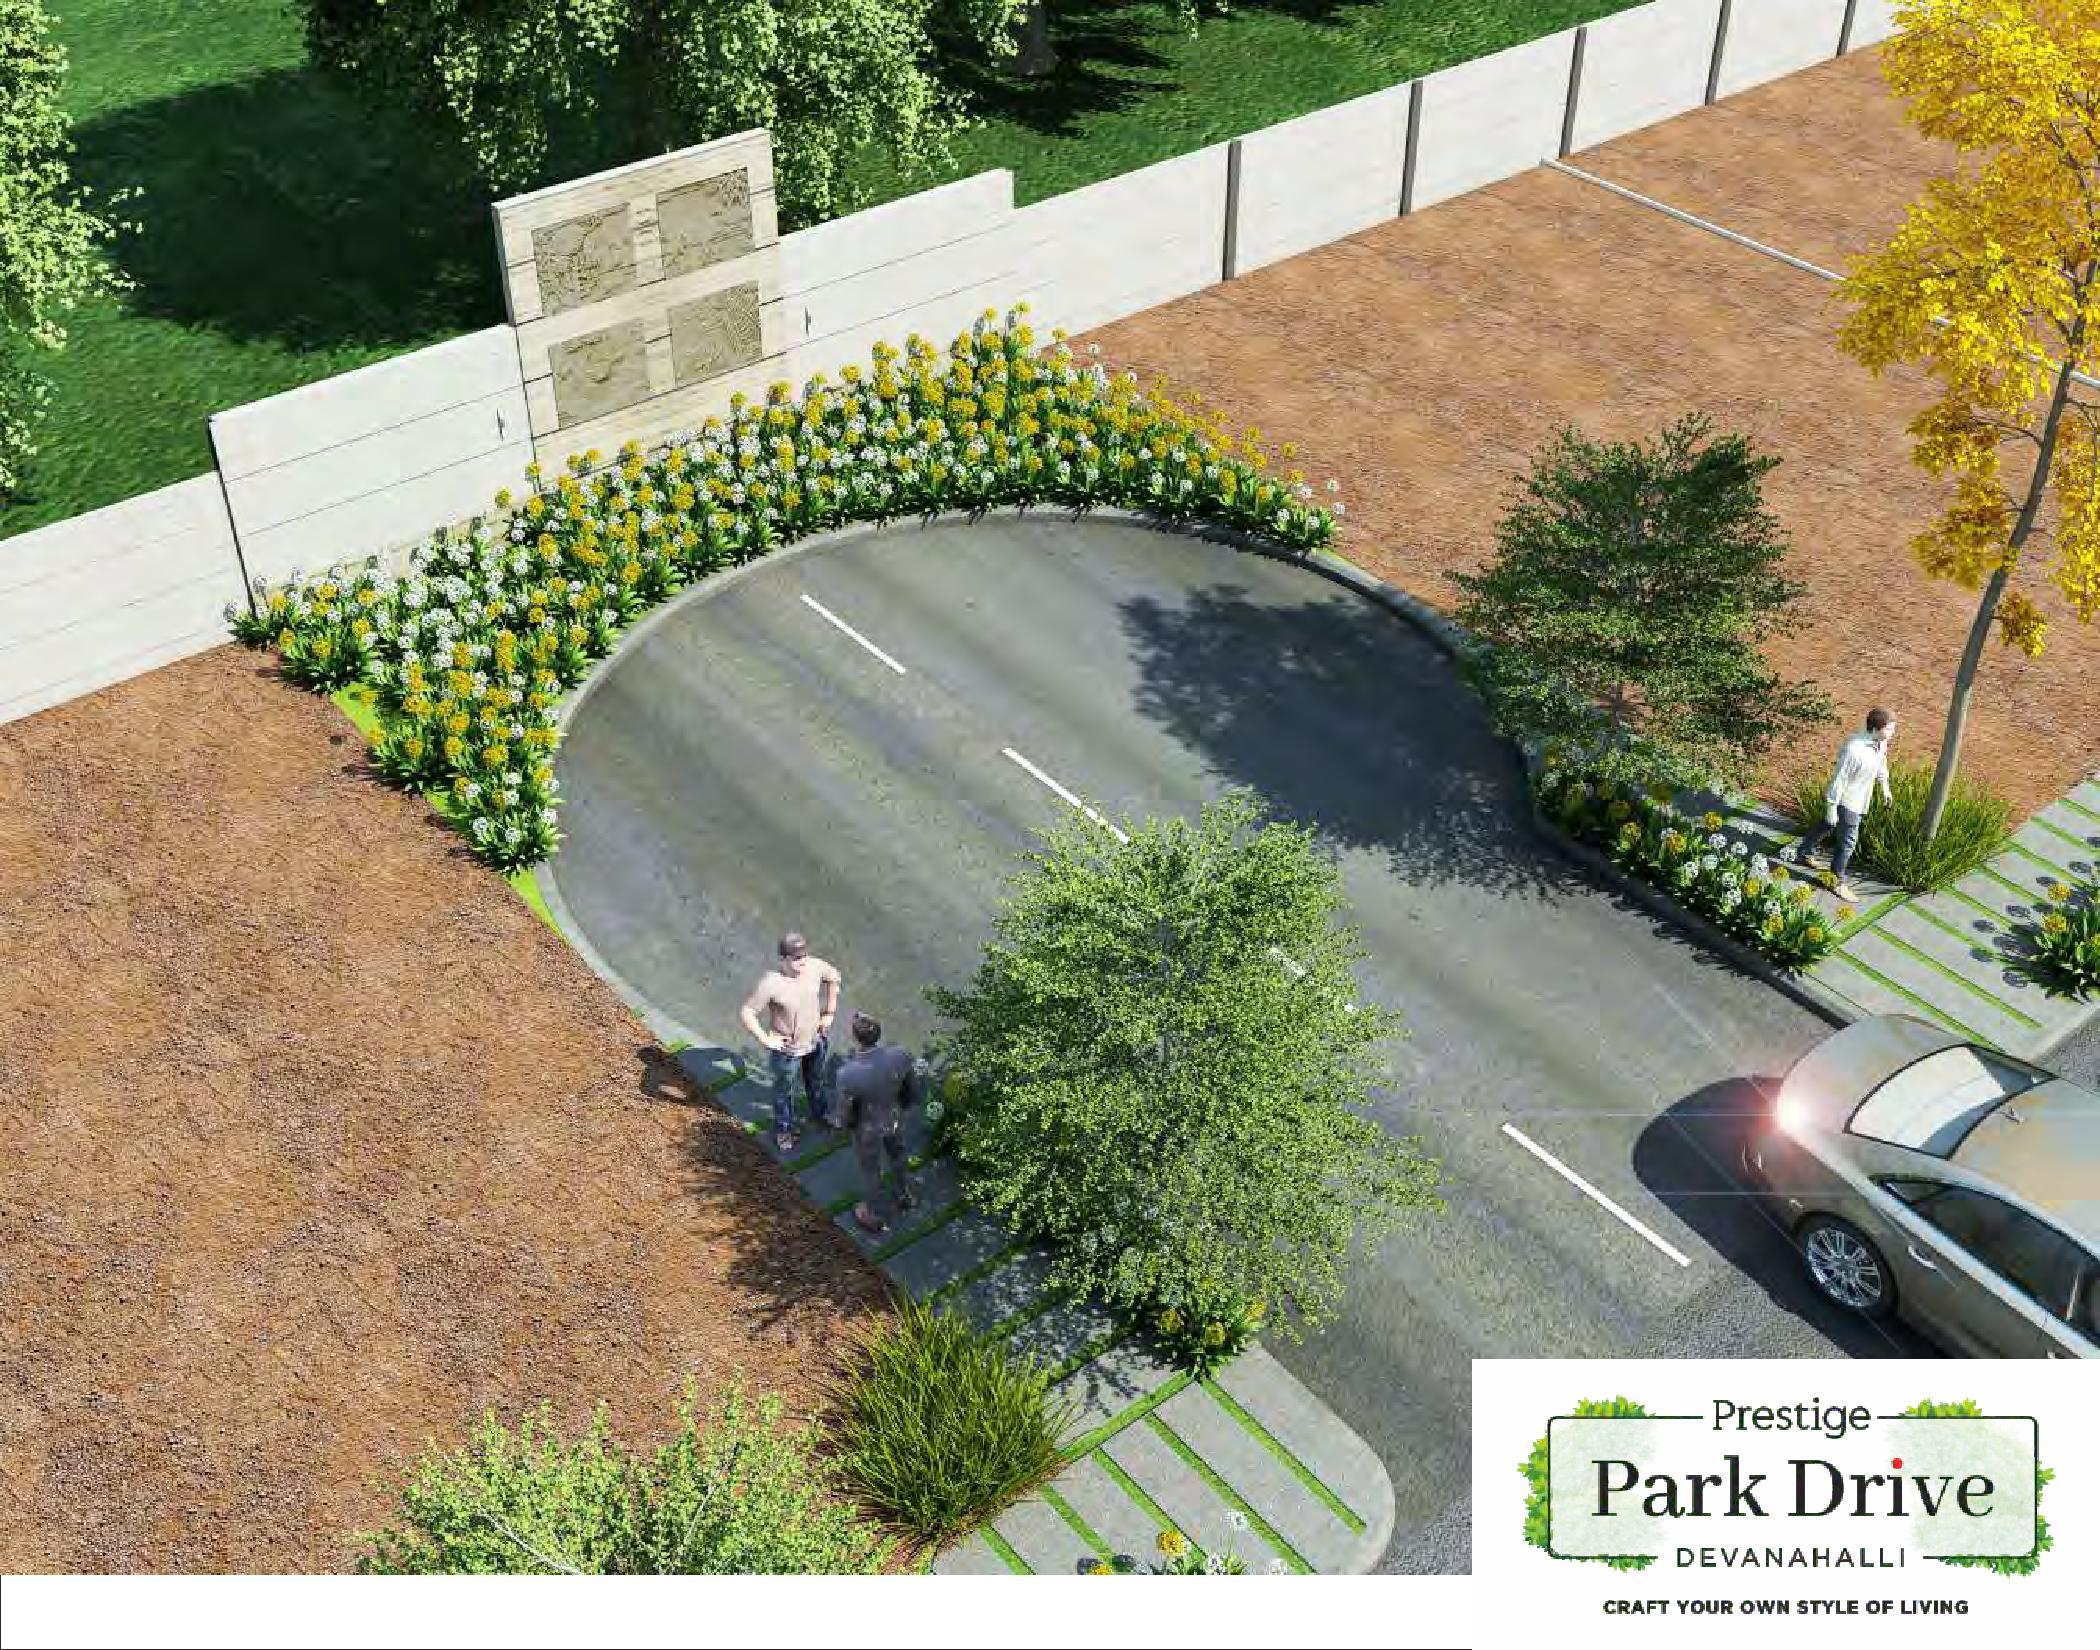 Prestige-Park-Drive-Plot-in-Devanahalli-Bangalore-Image-10